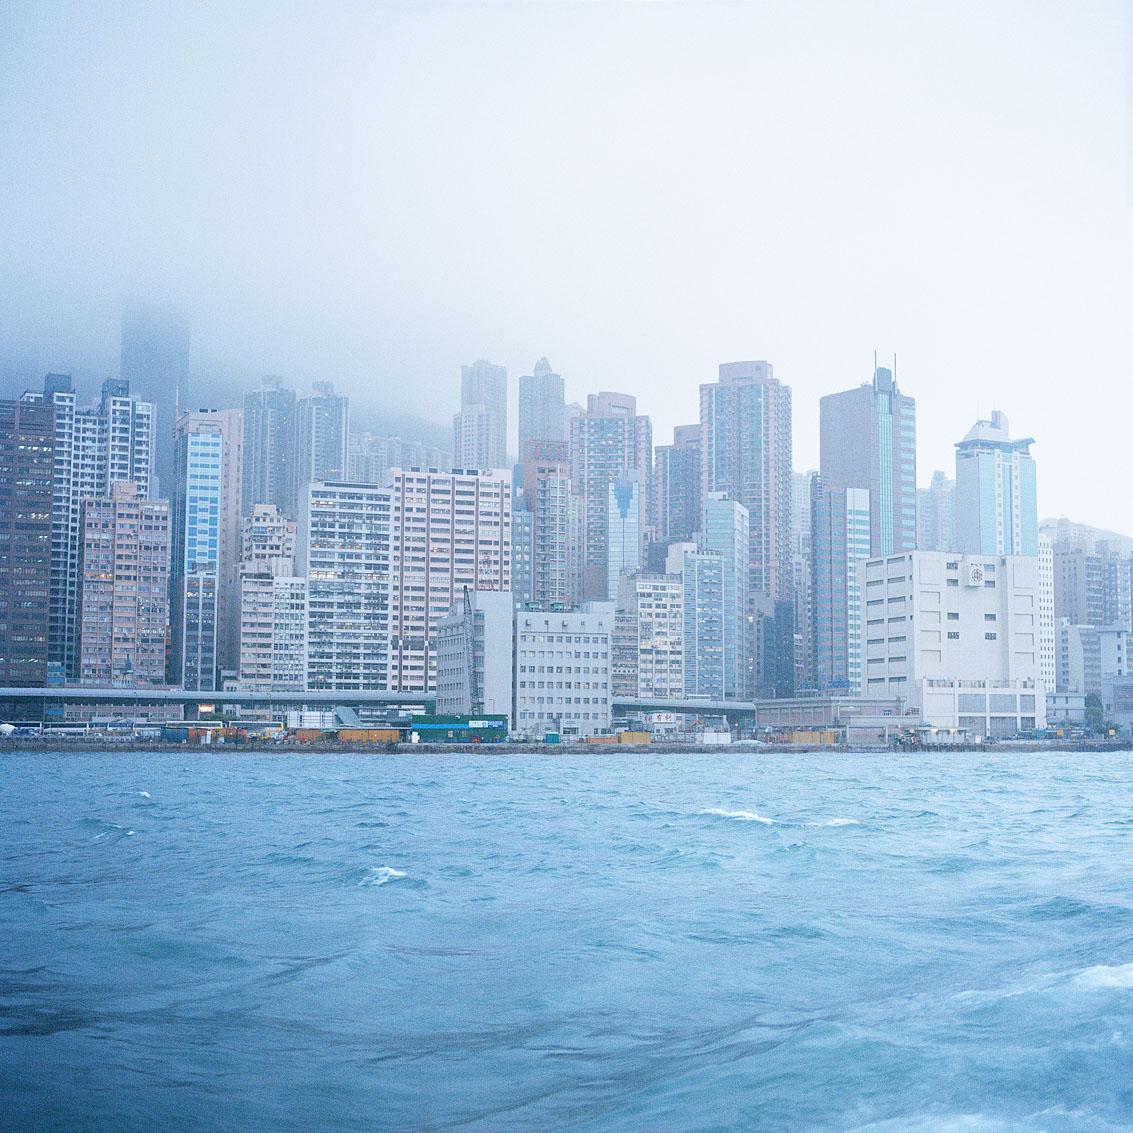 La baie de Hong Kong.